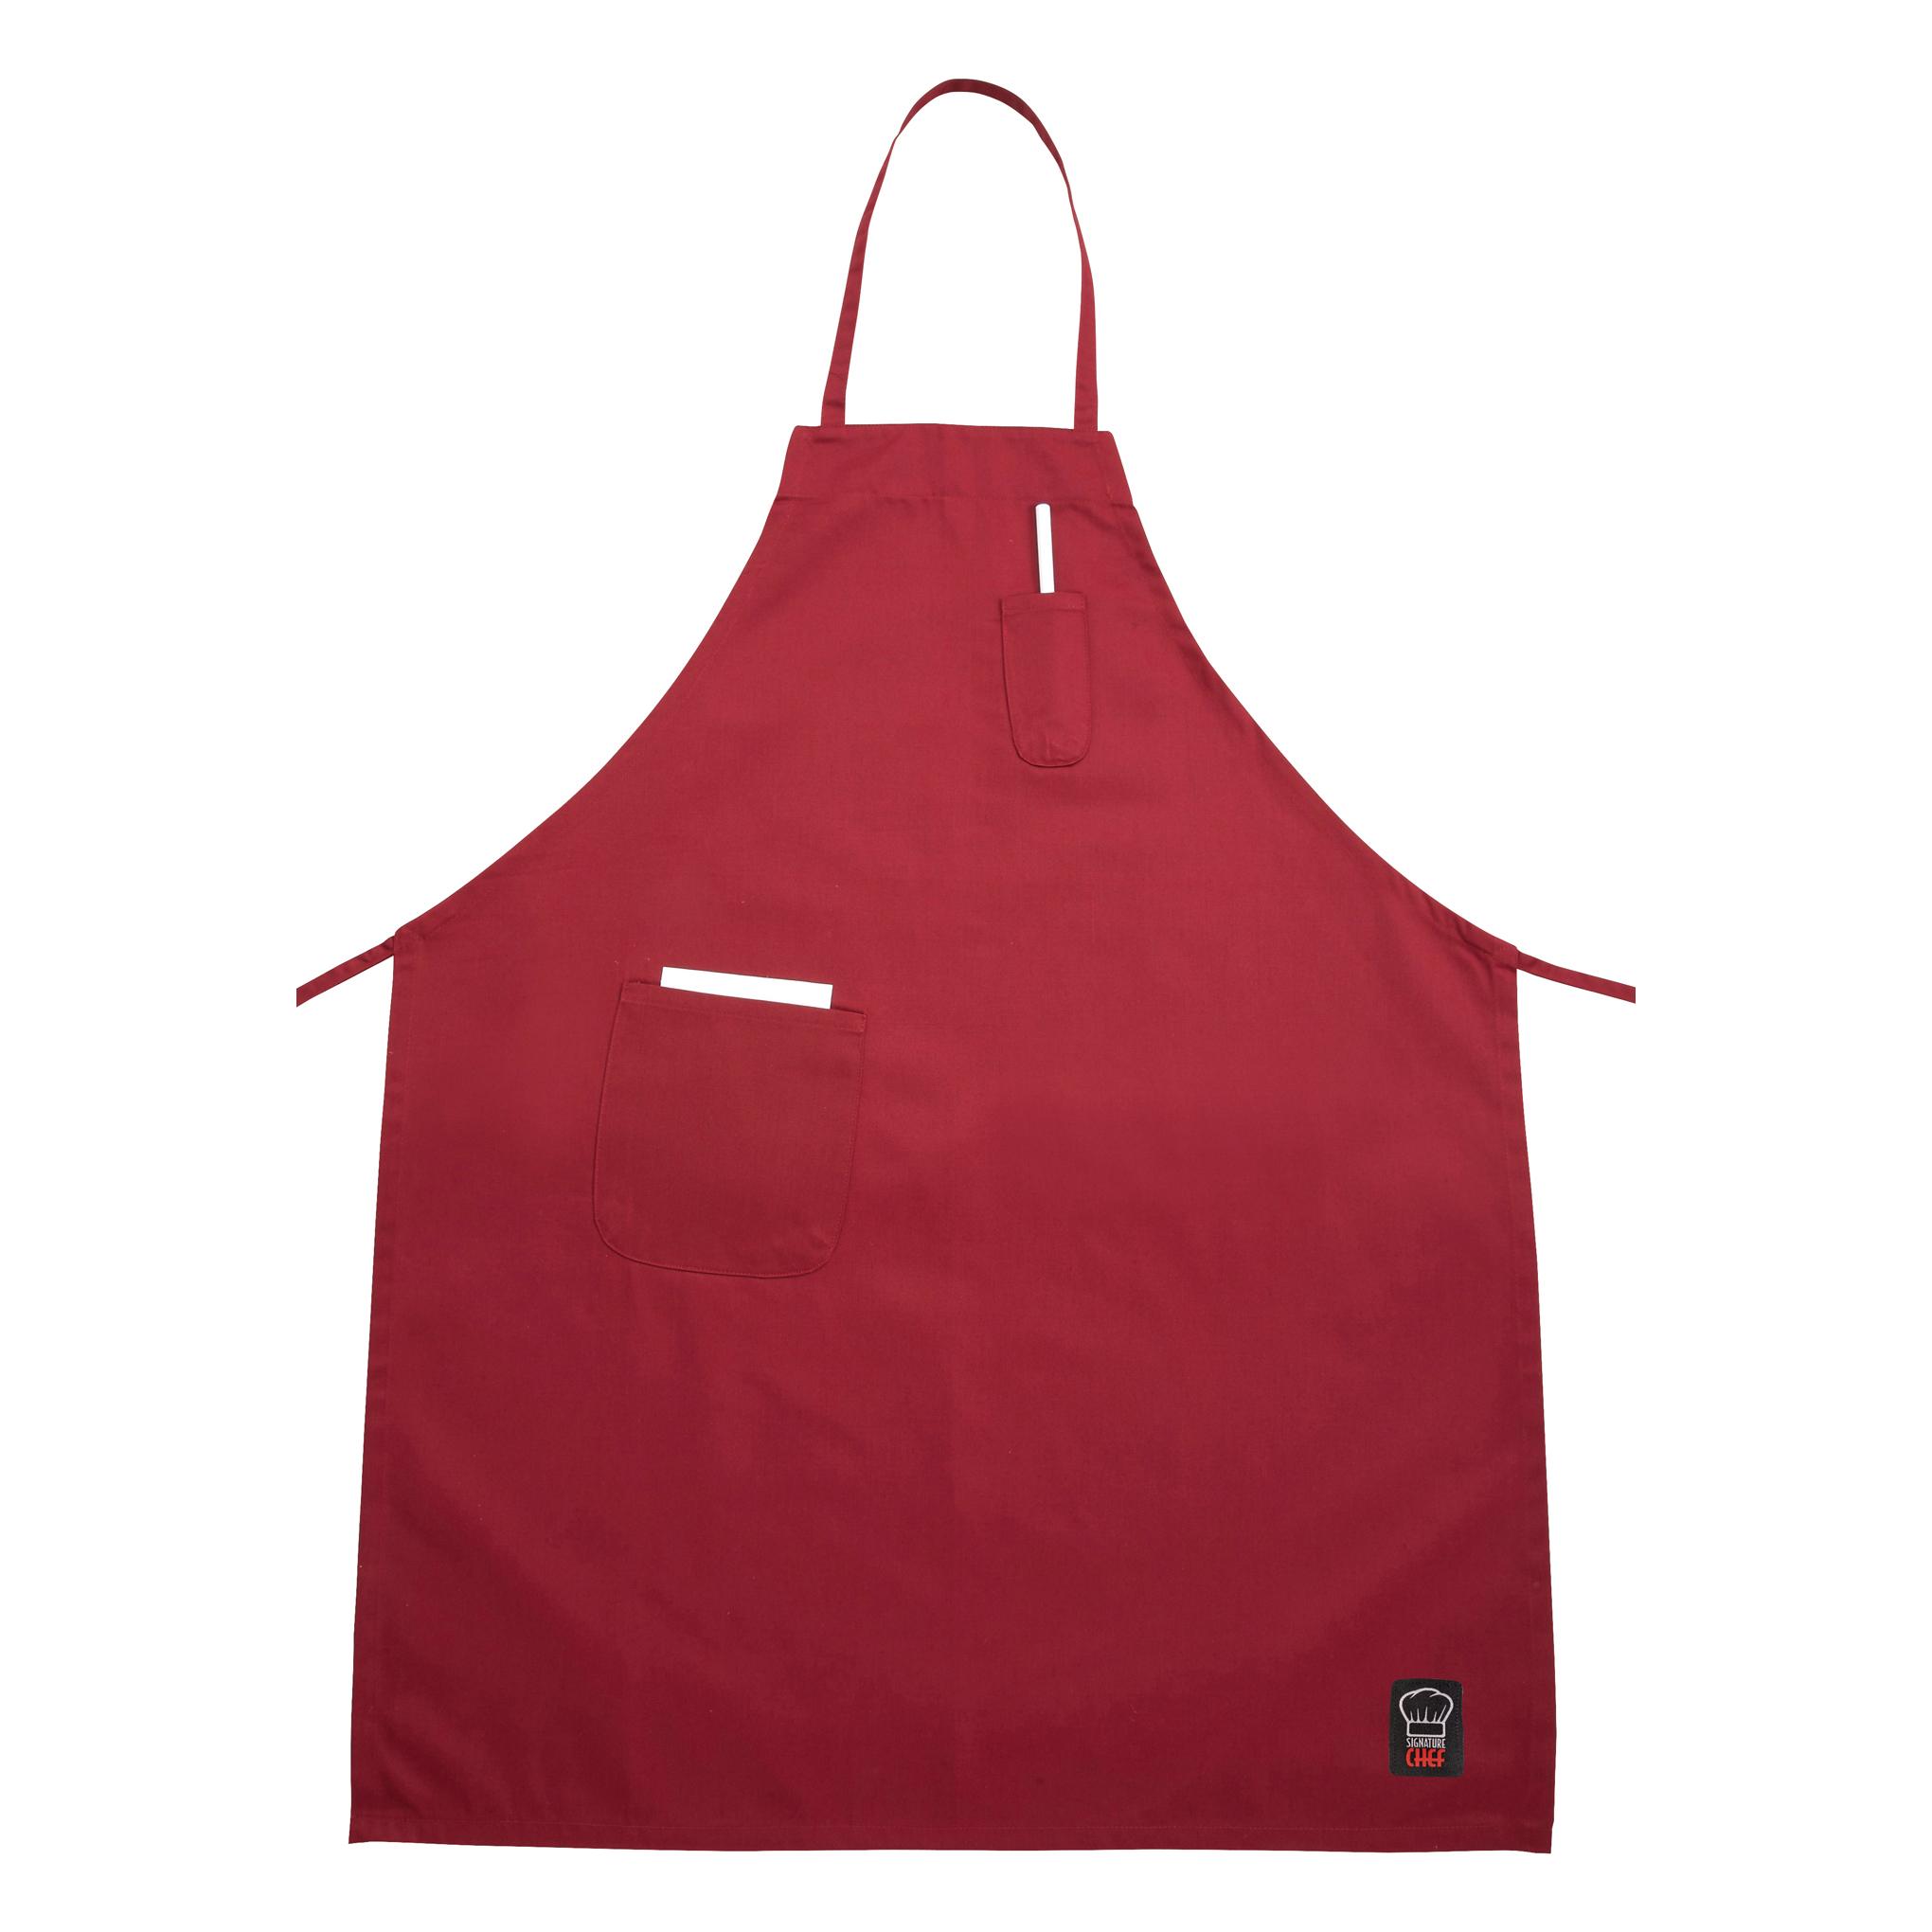 Winco BA-PRD bib apron